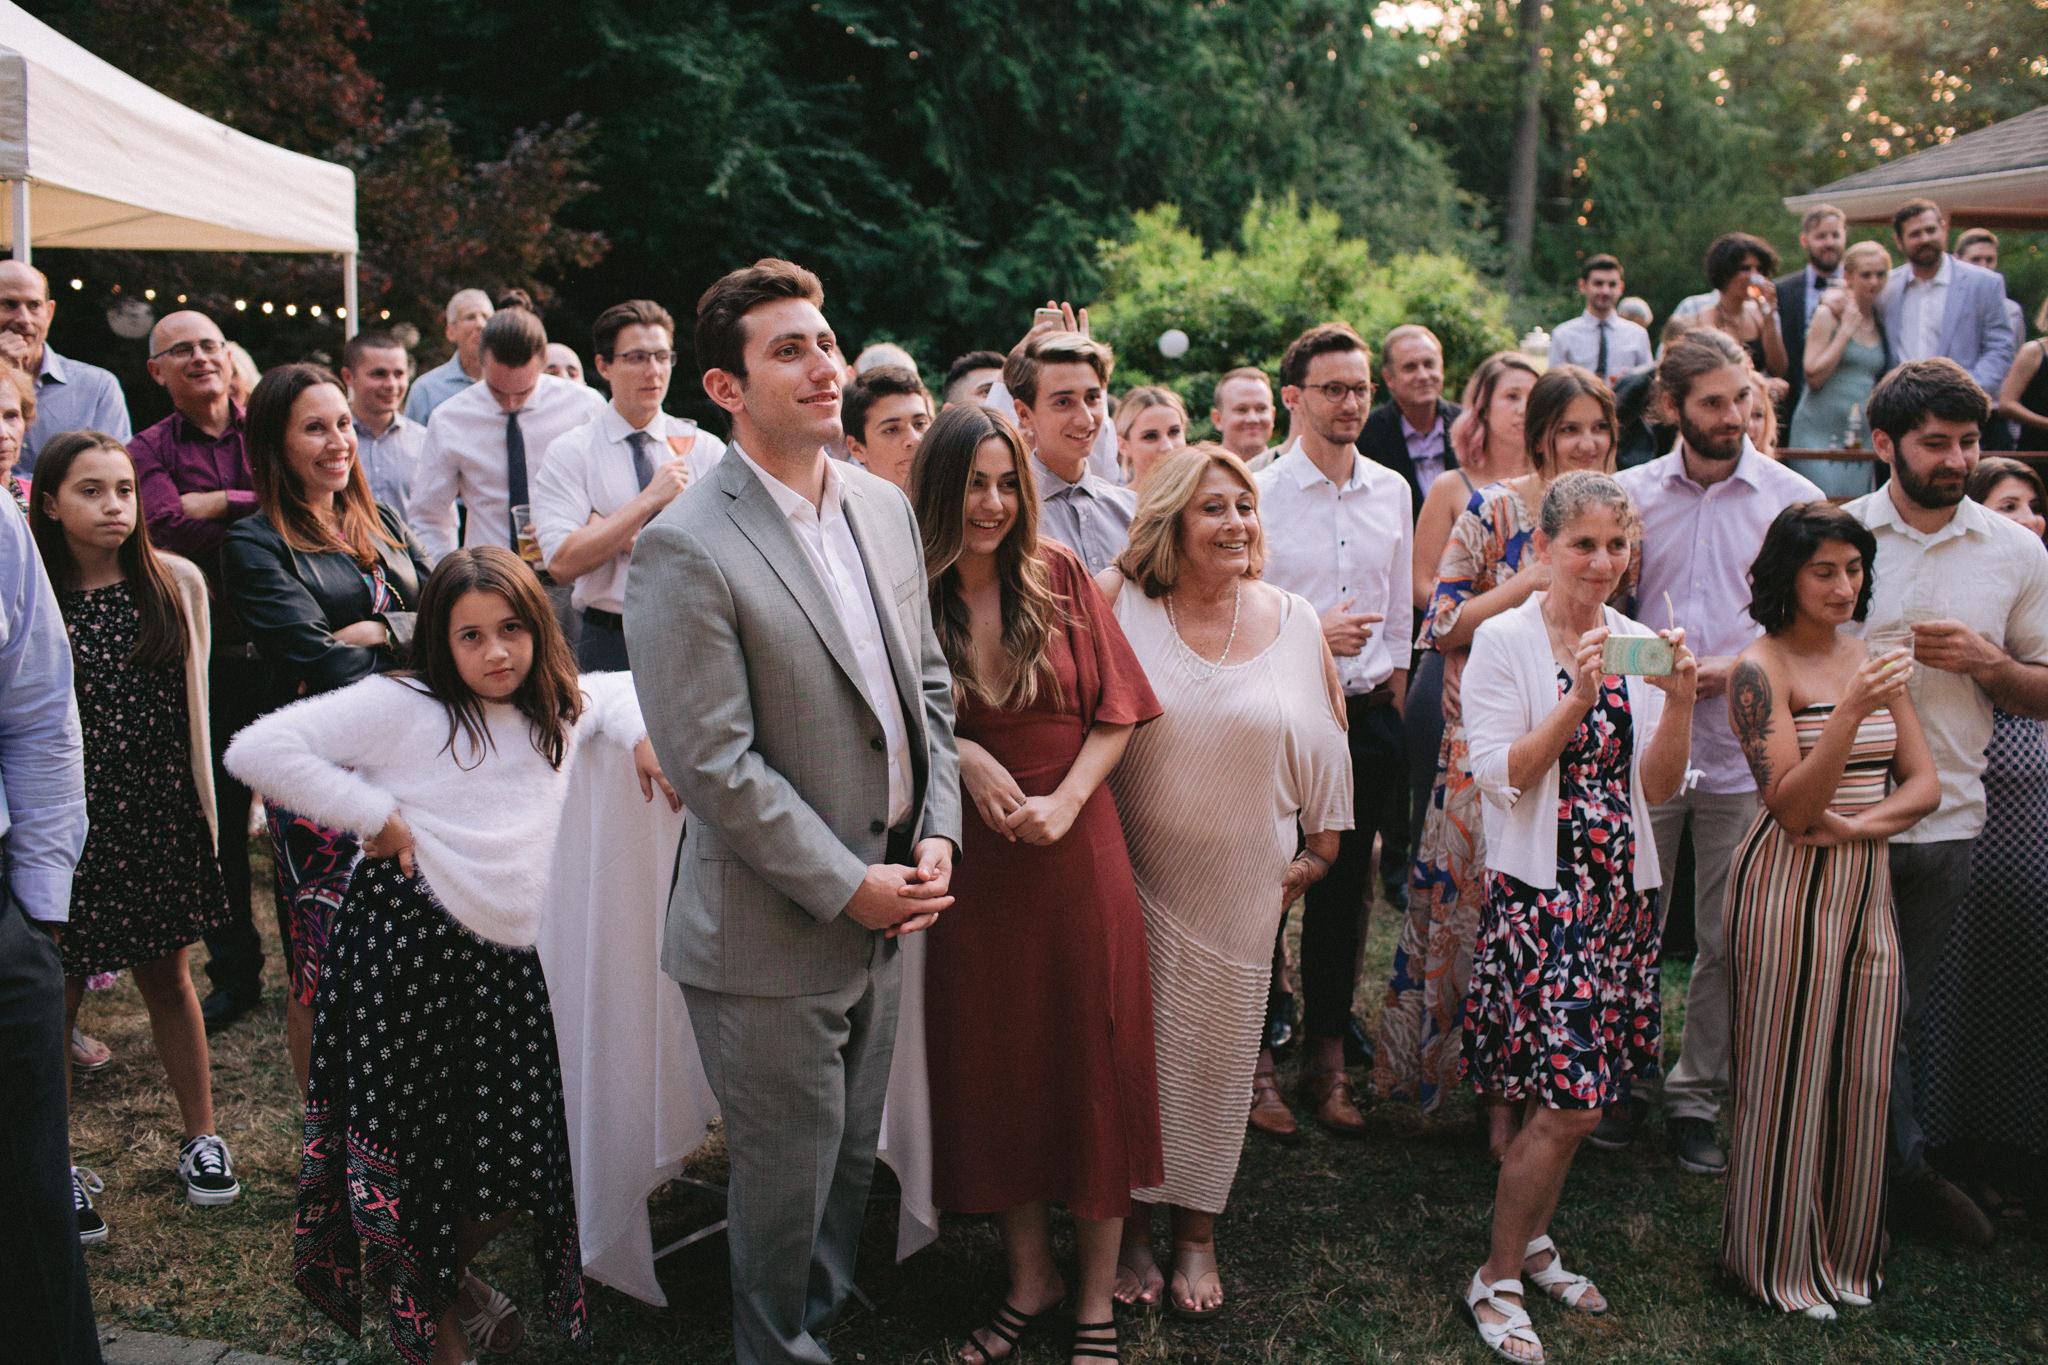 Backyard-Bainbridge-Island-Wedding-Alycia-Lovell-Photography-186.JPG